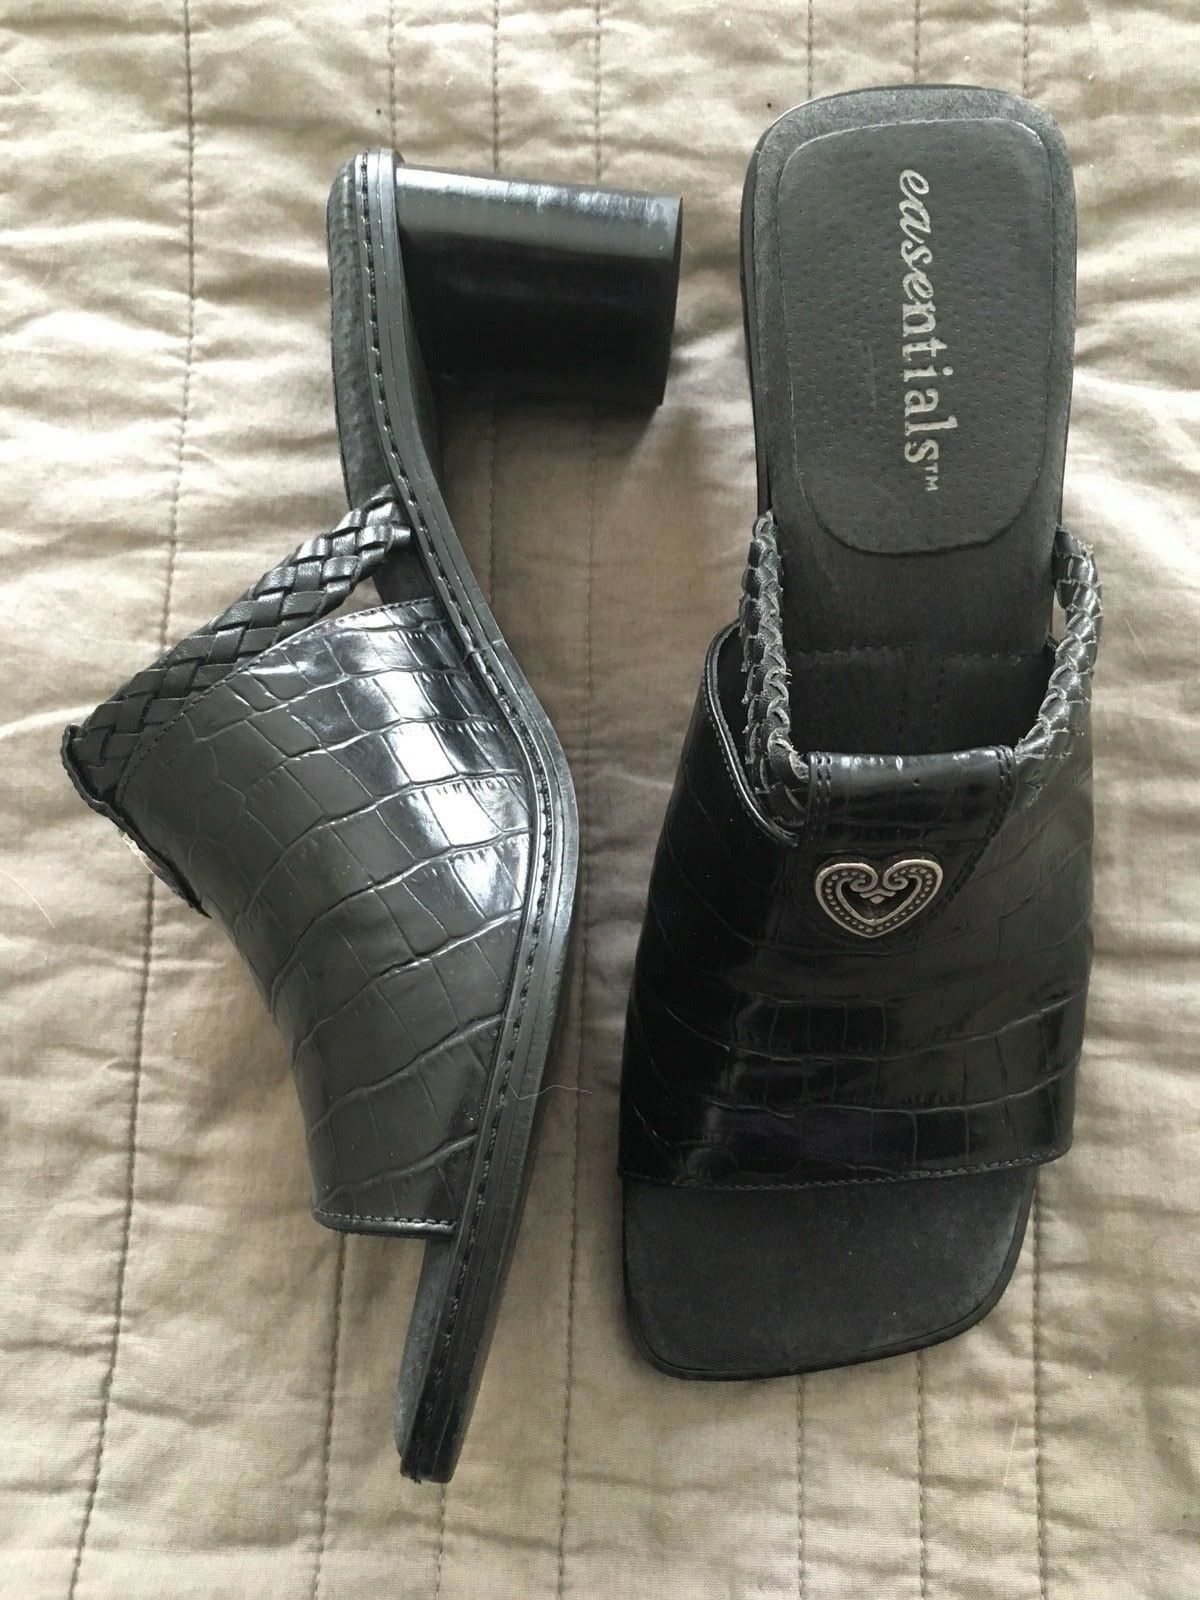 Etienne Aigner Easentials Size 7.5 M Black Leather Clog Silver Heart Charm EUC